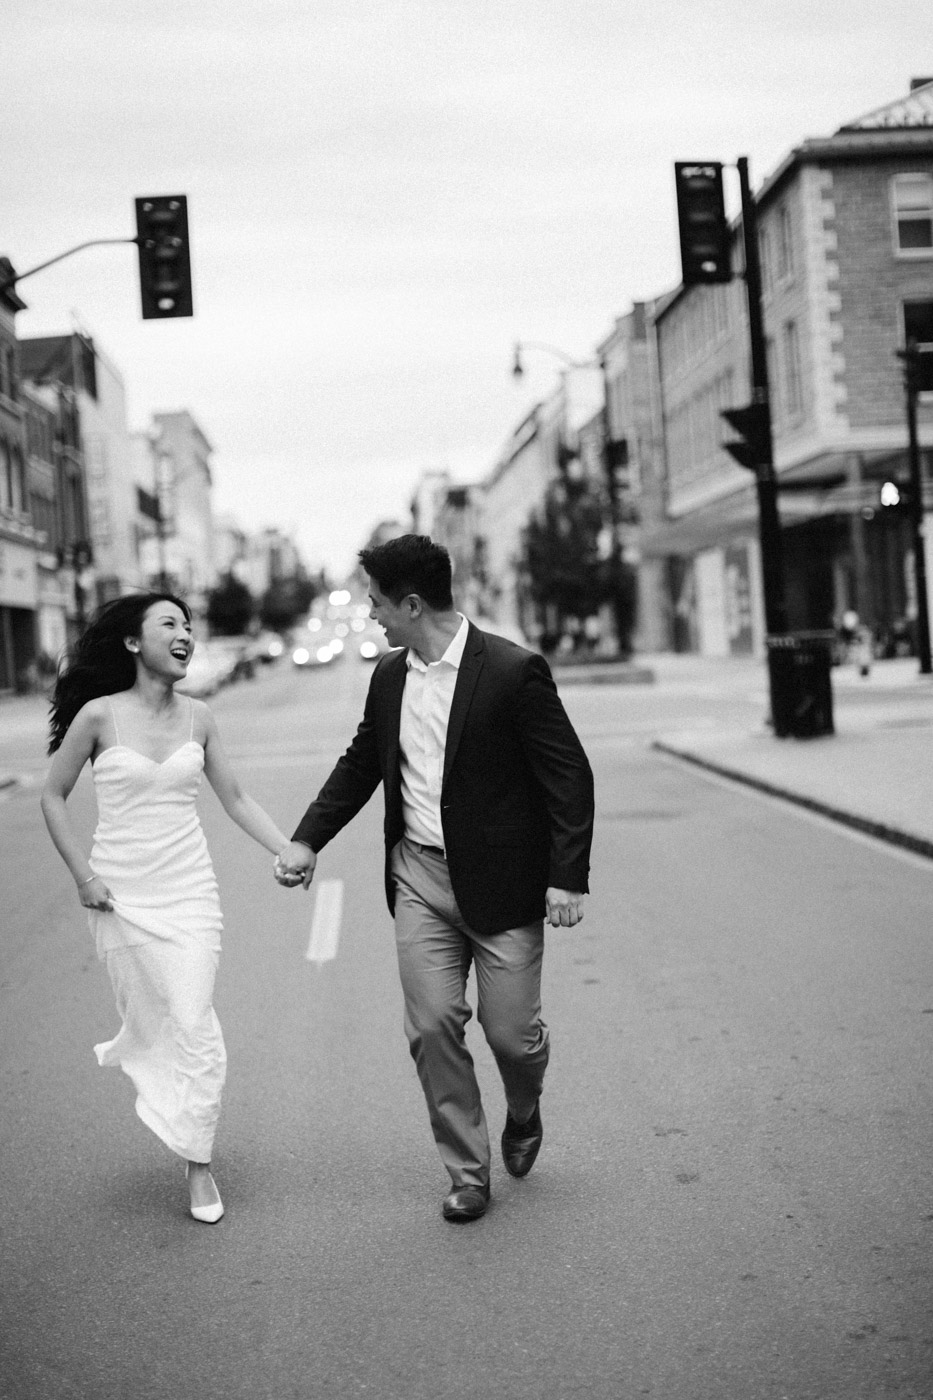 toronto_wedding_photographer_fine_art_documentary 2017-111.jpg